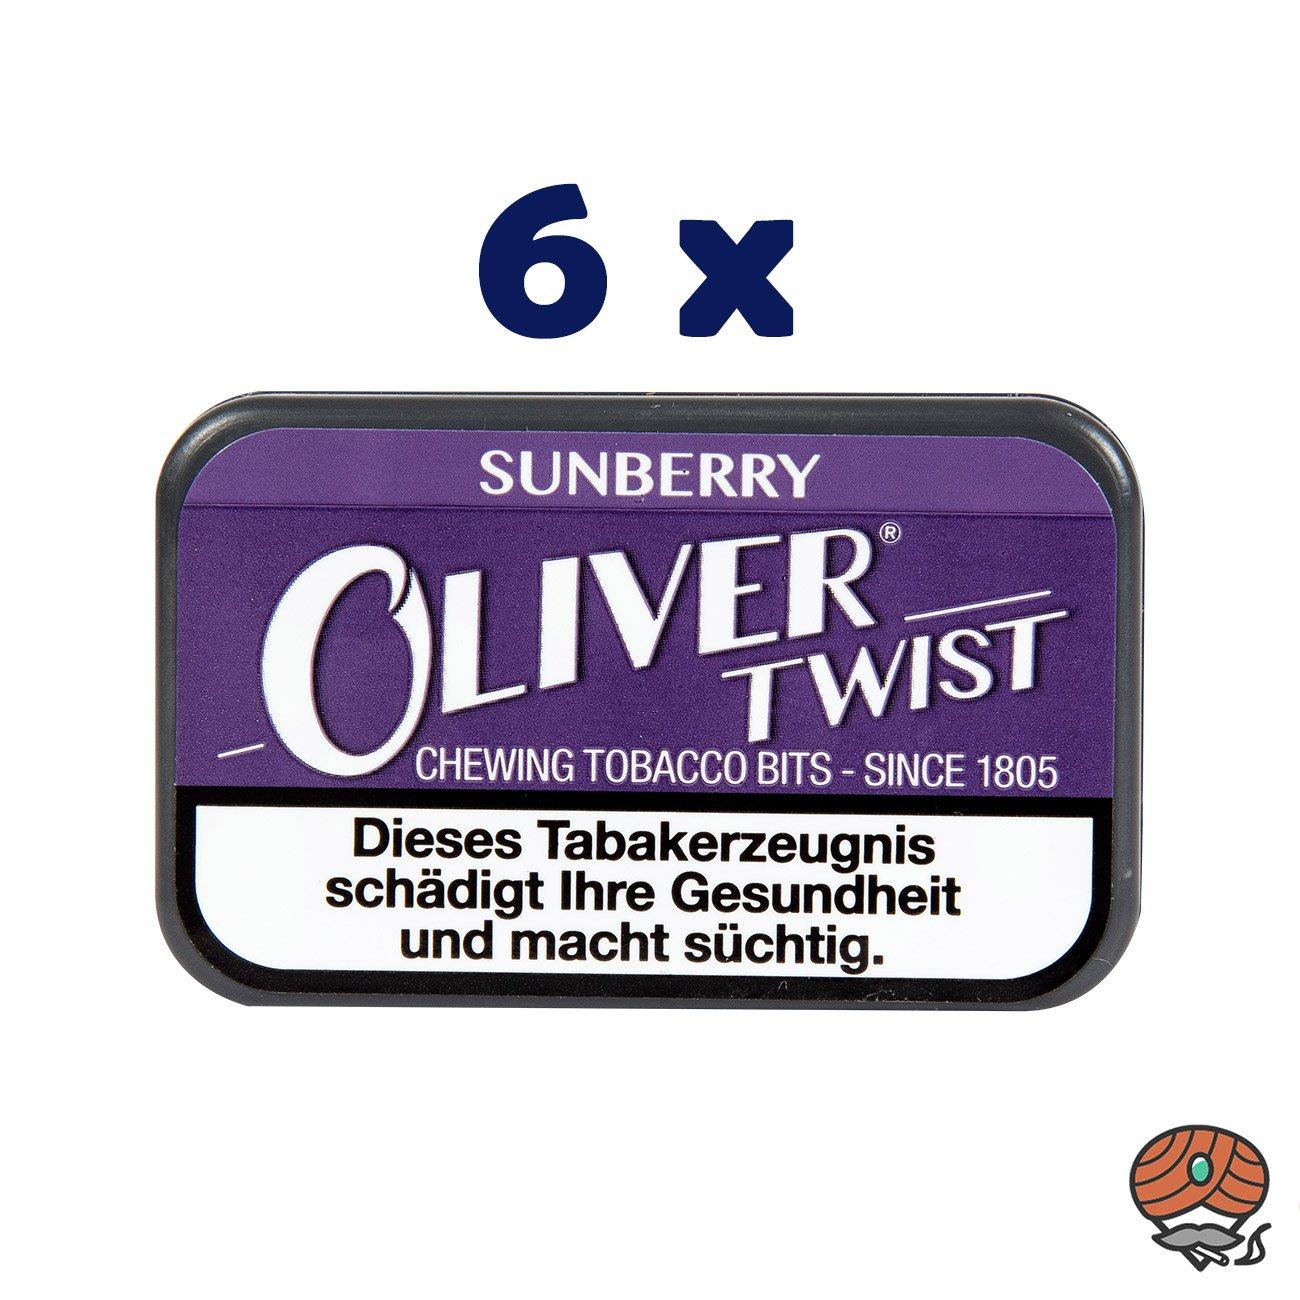 6 x Oliver Twist SUNBERRY Tabakpastillen, Kautabak, Chewing Bits